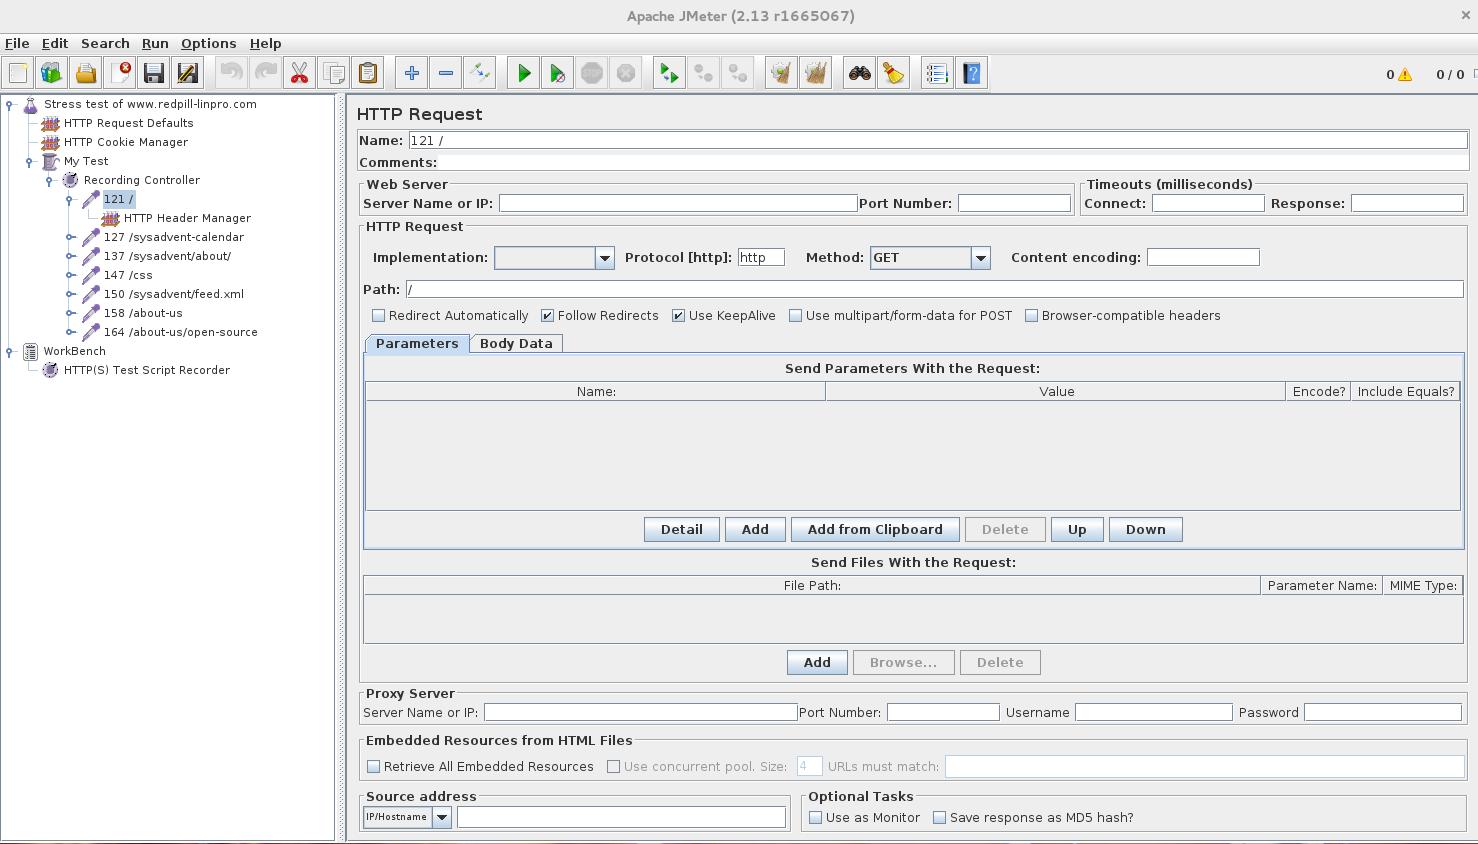 Stress testing with Apache JMeter